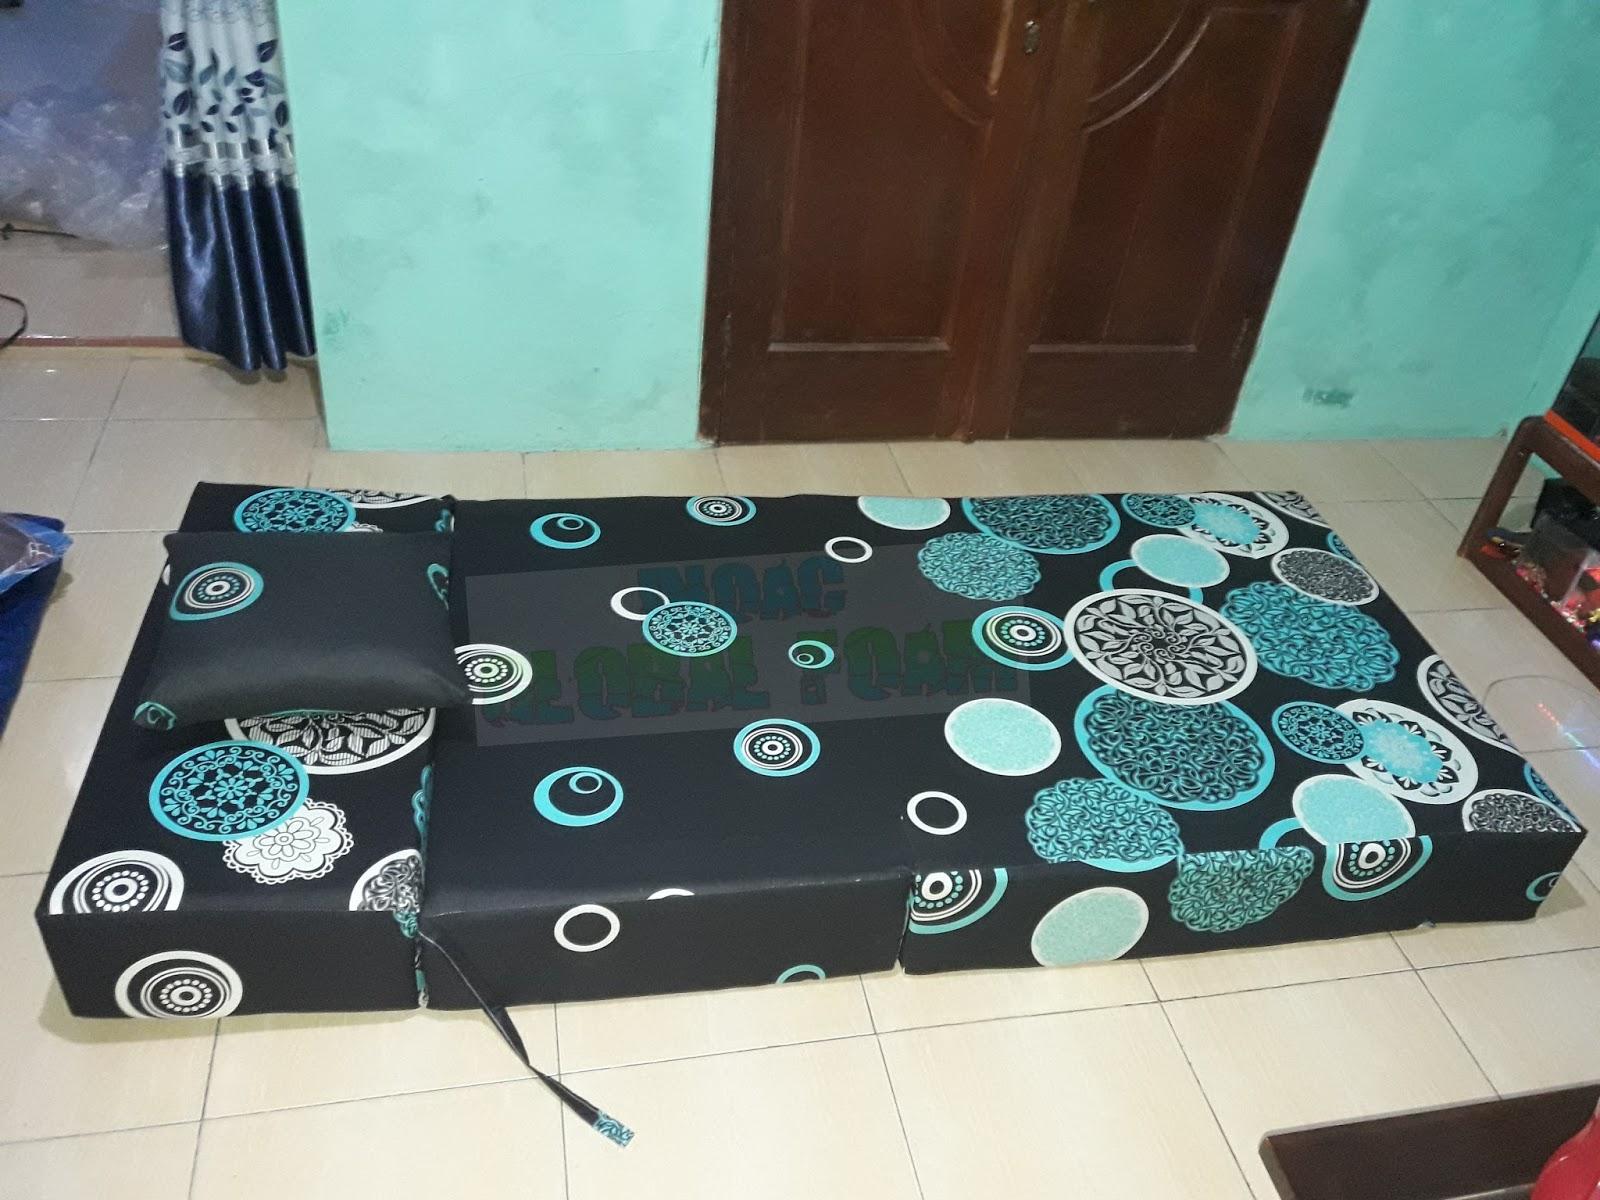 Harga Sofa Bed Inoac 2017 Leather Corner Gumtree Ni Kasur 2018 Distributor Dan Agen Resmi